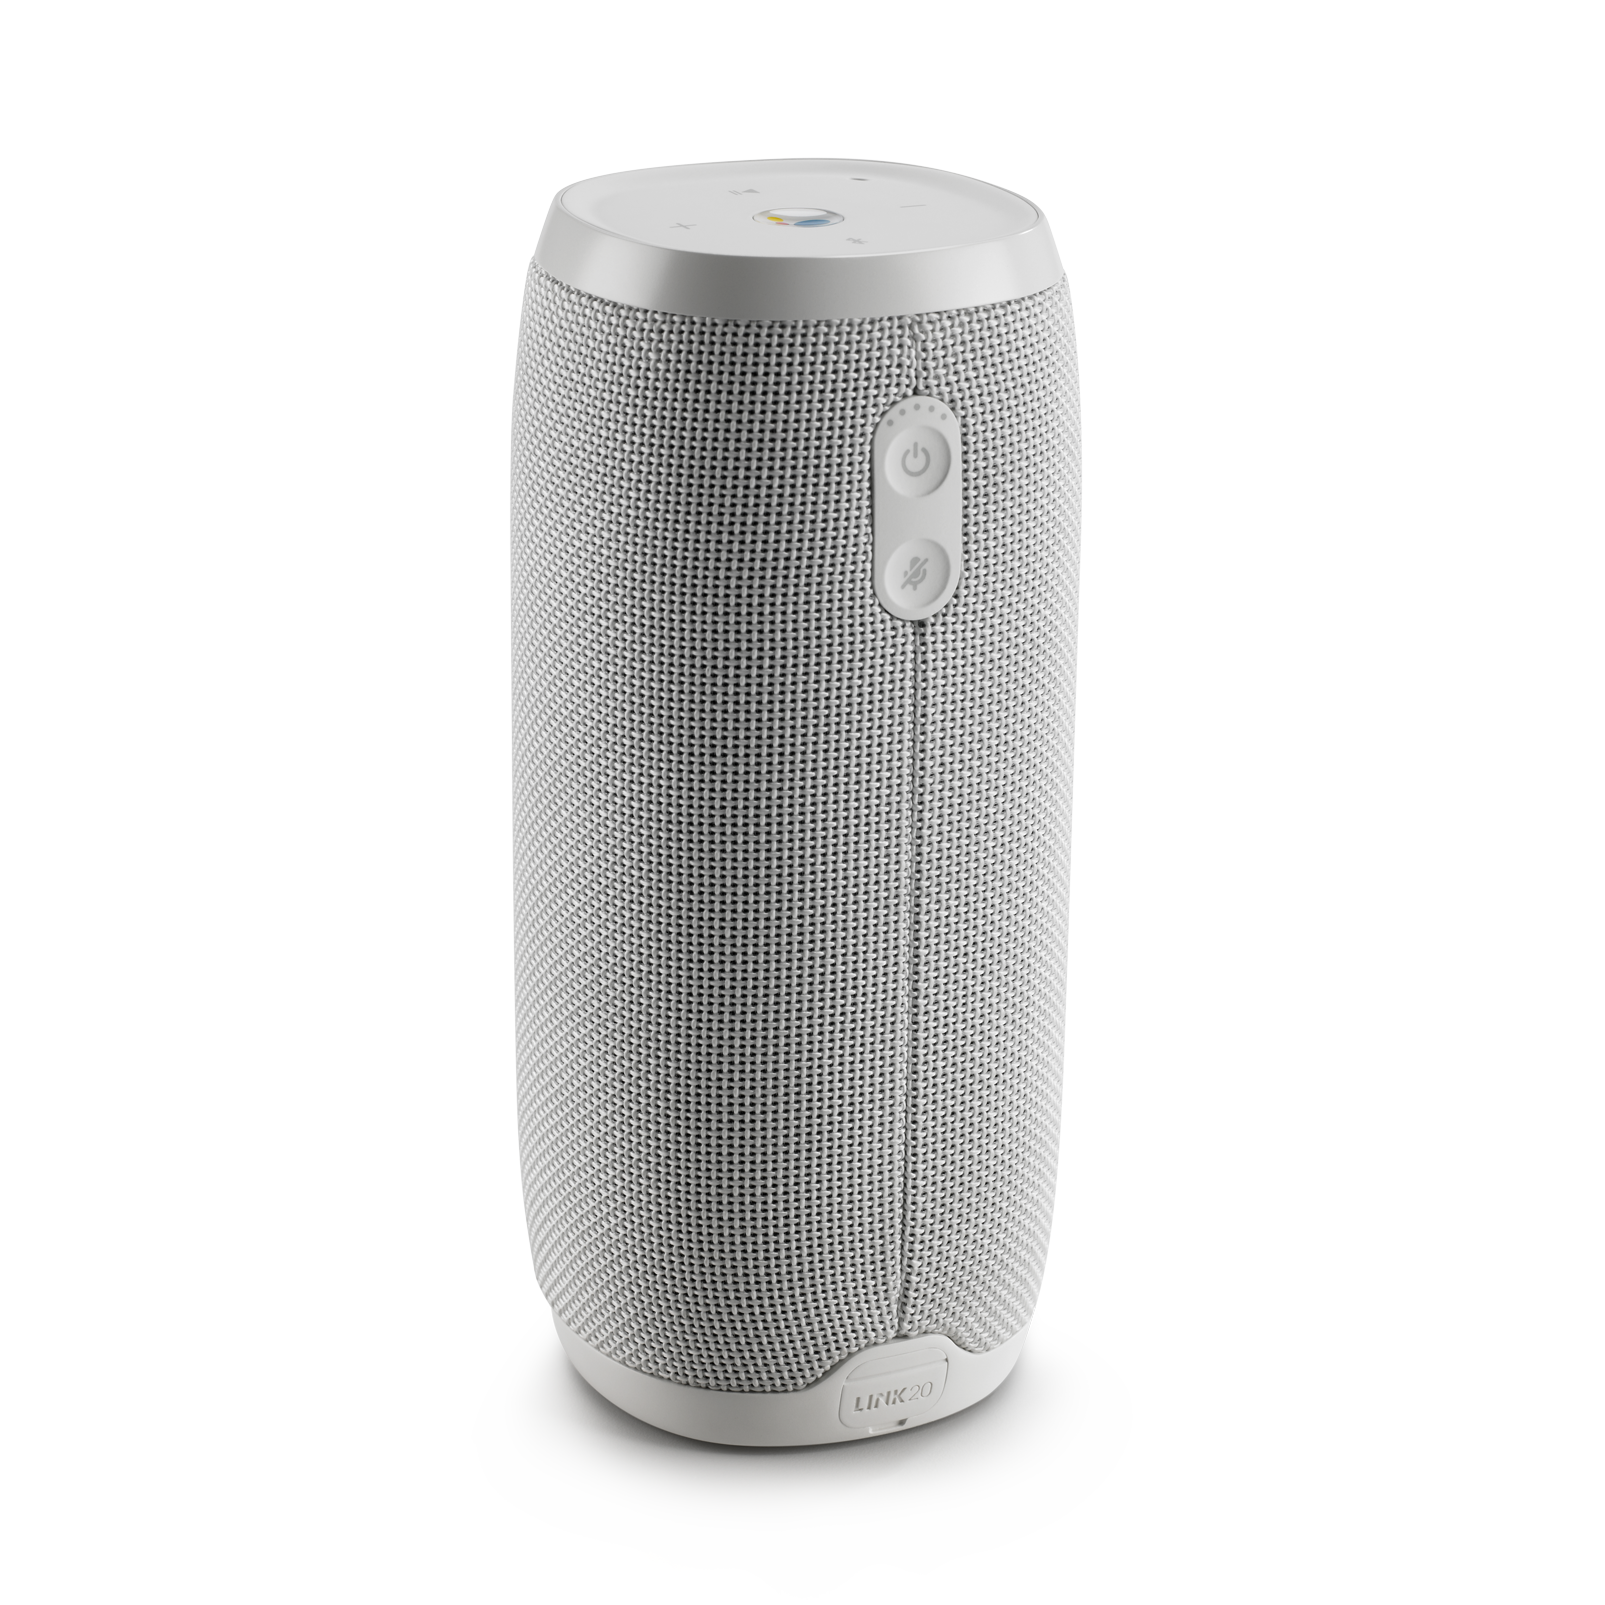 JBL Link 20 - White - Voice-activated portable speaker - Back